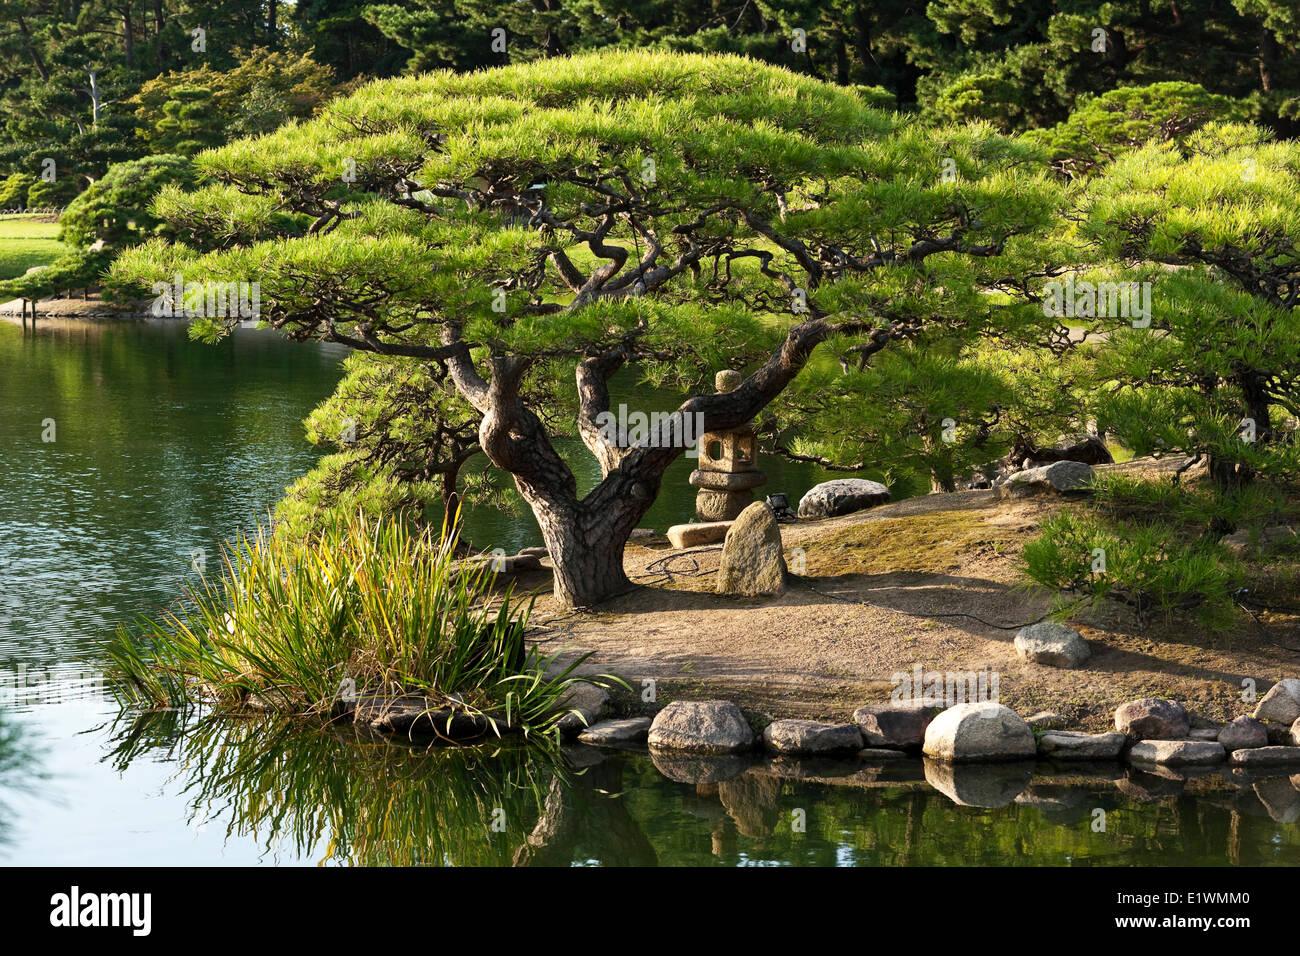 Most beautiful gardens - One The Top Three Most Beautiful Gardens In Japan Korakuen Lies To The South Okayama Castle